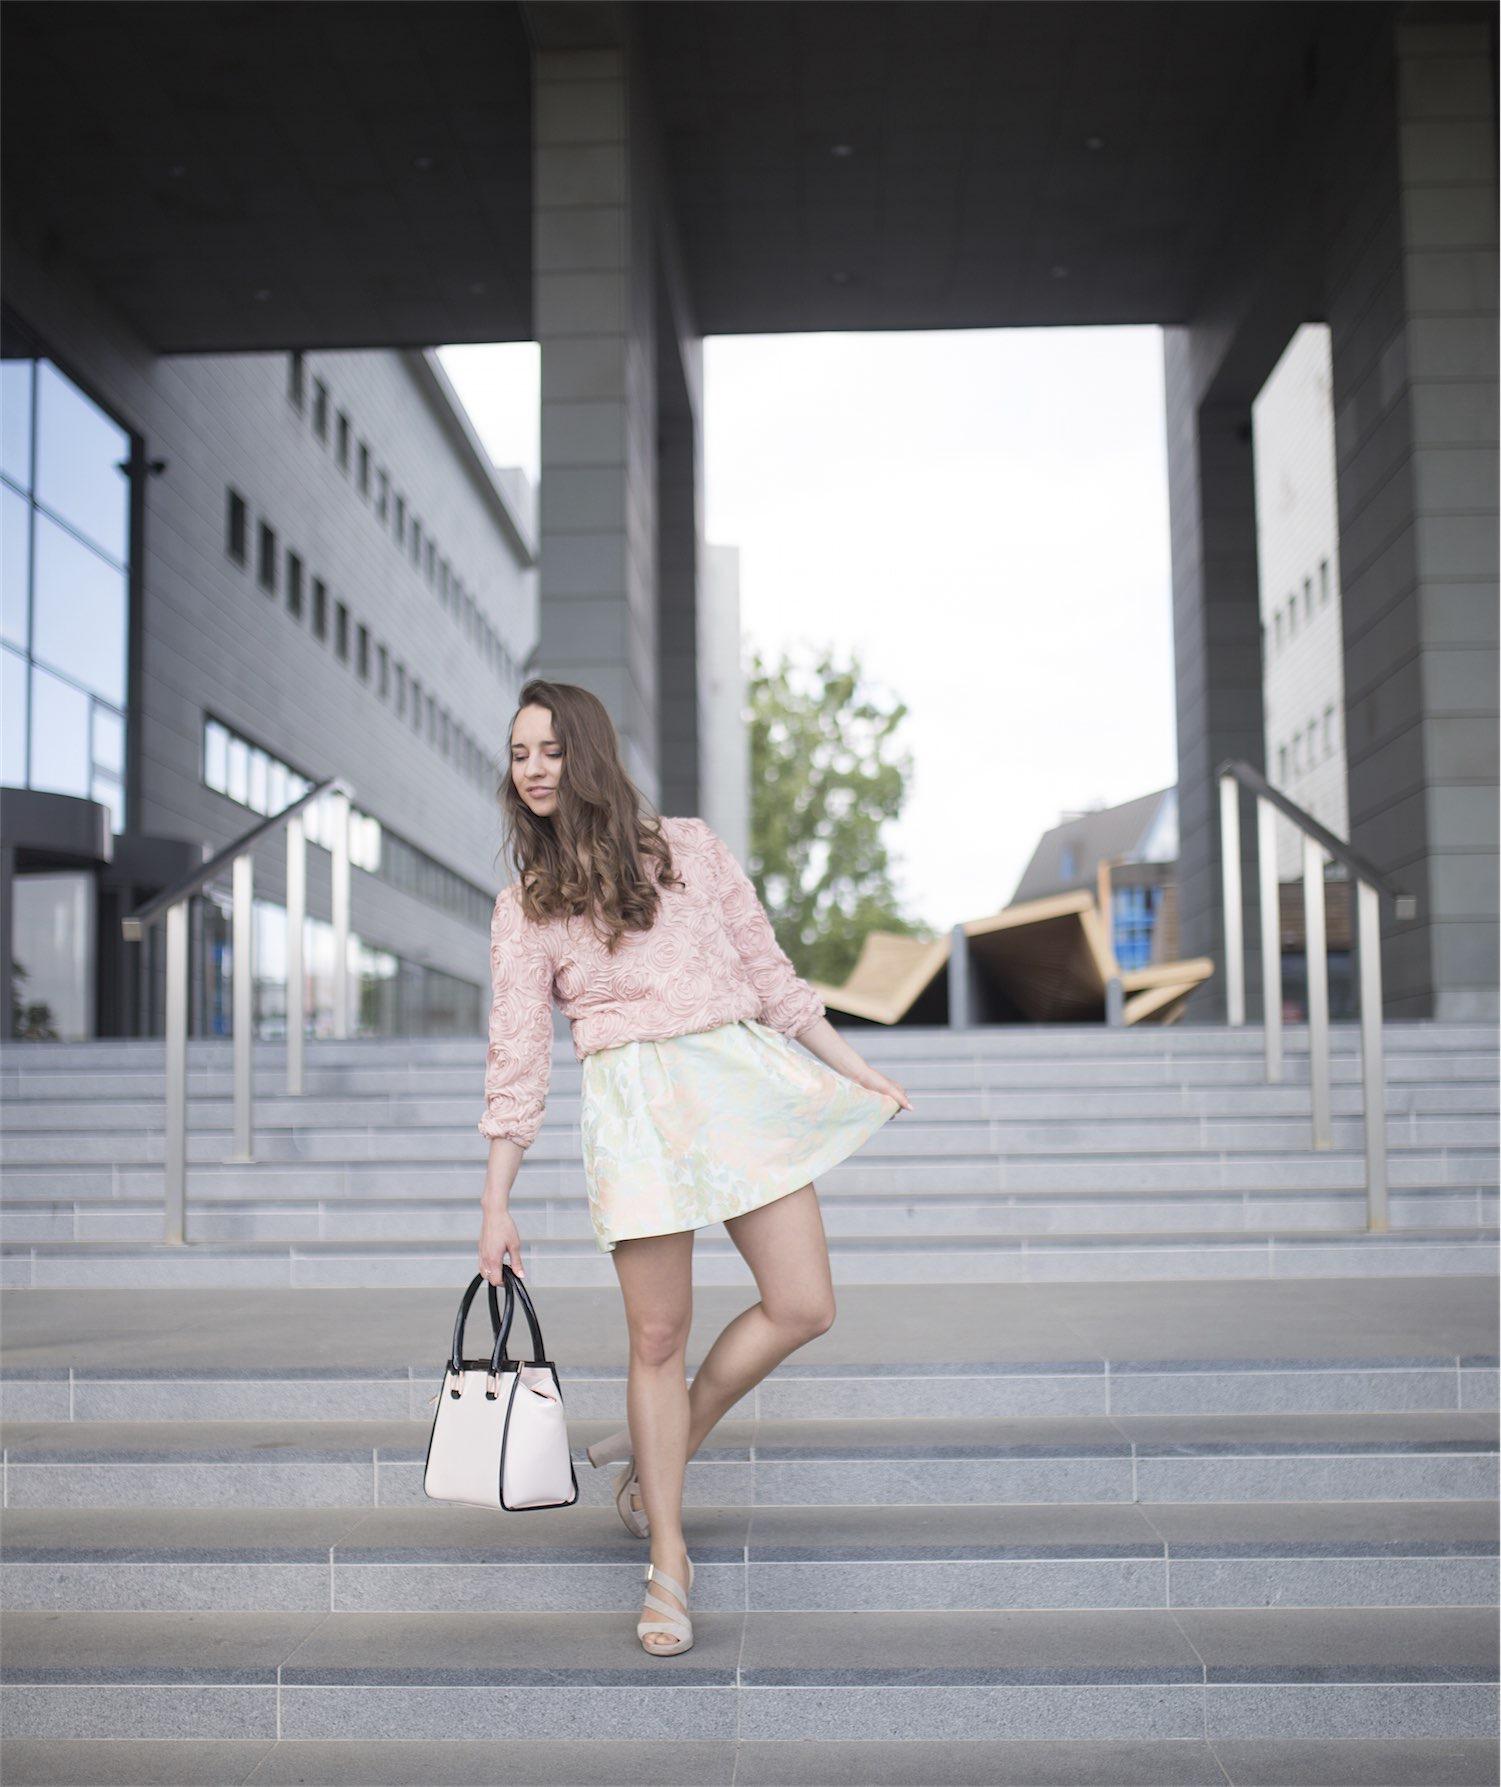 fashion-blogger-kateillustrate-tedbaker-skirt2